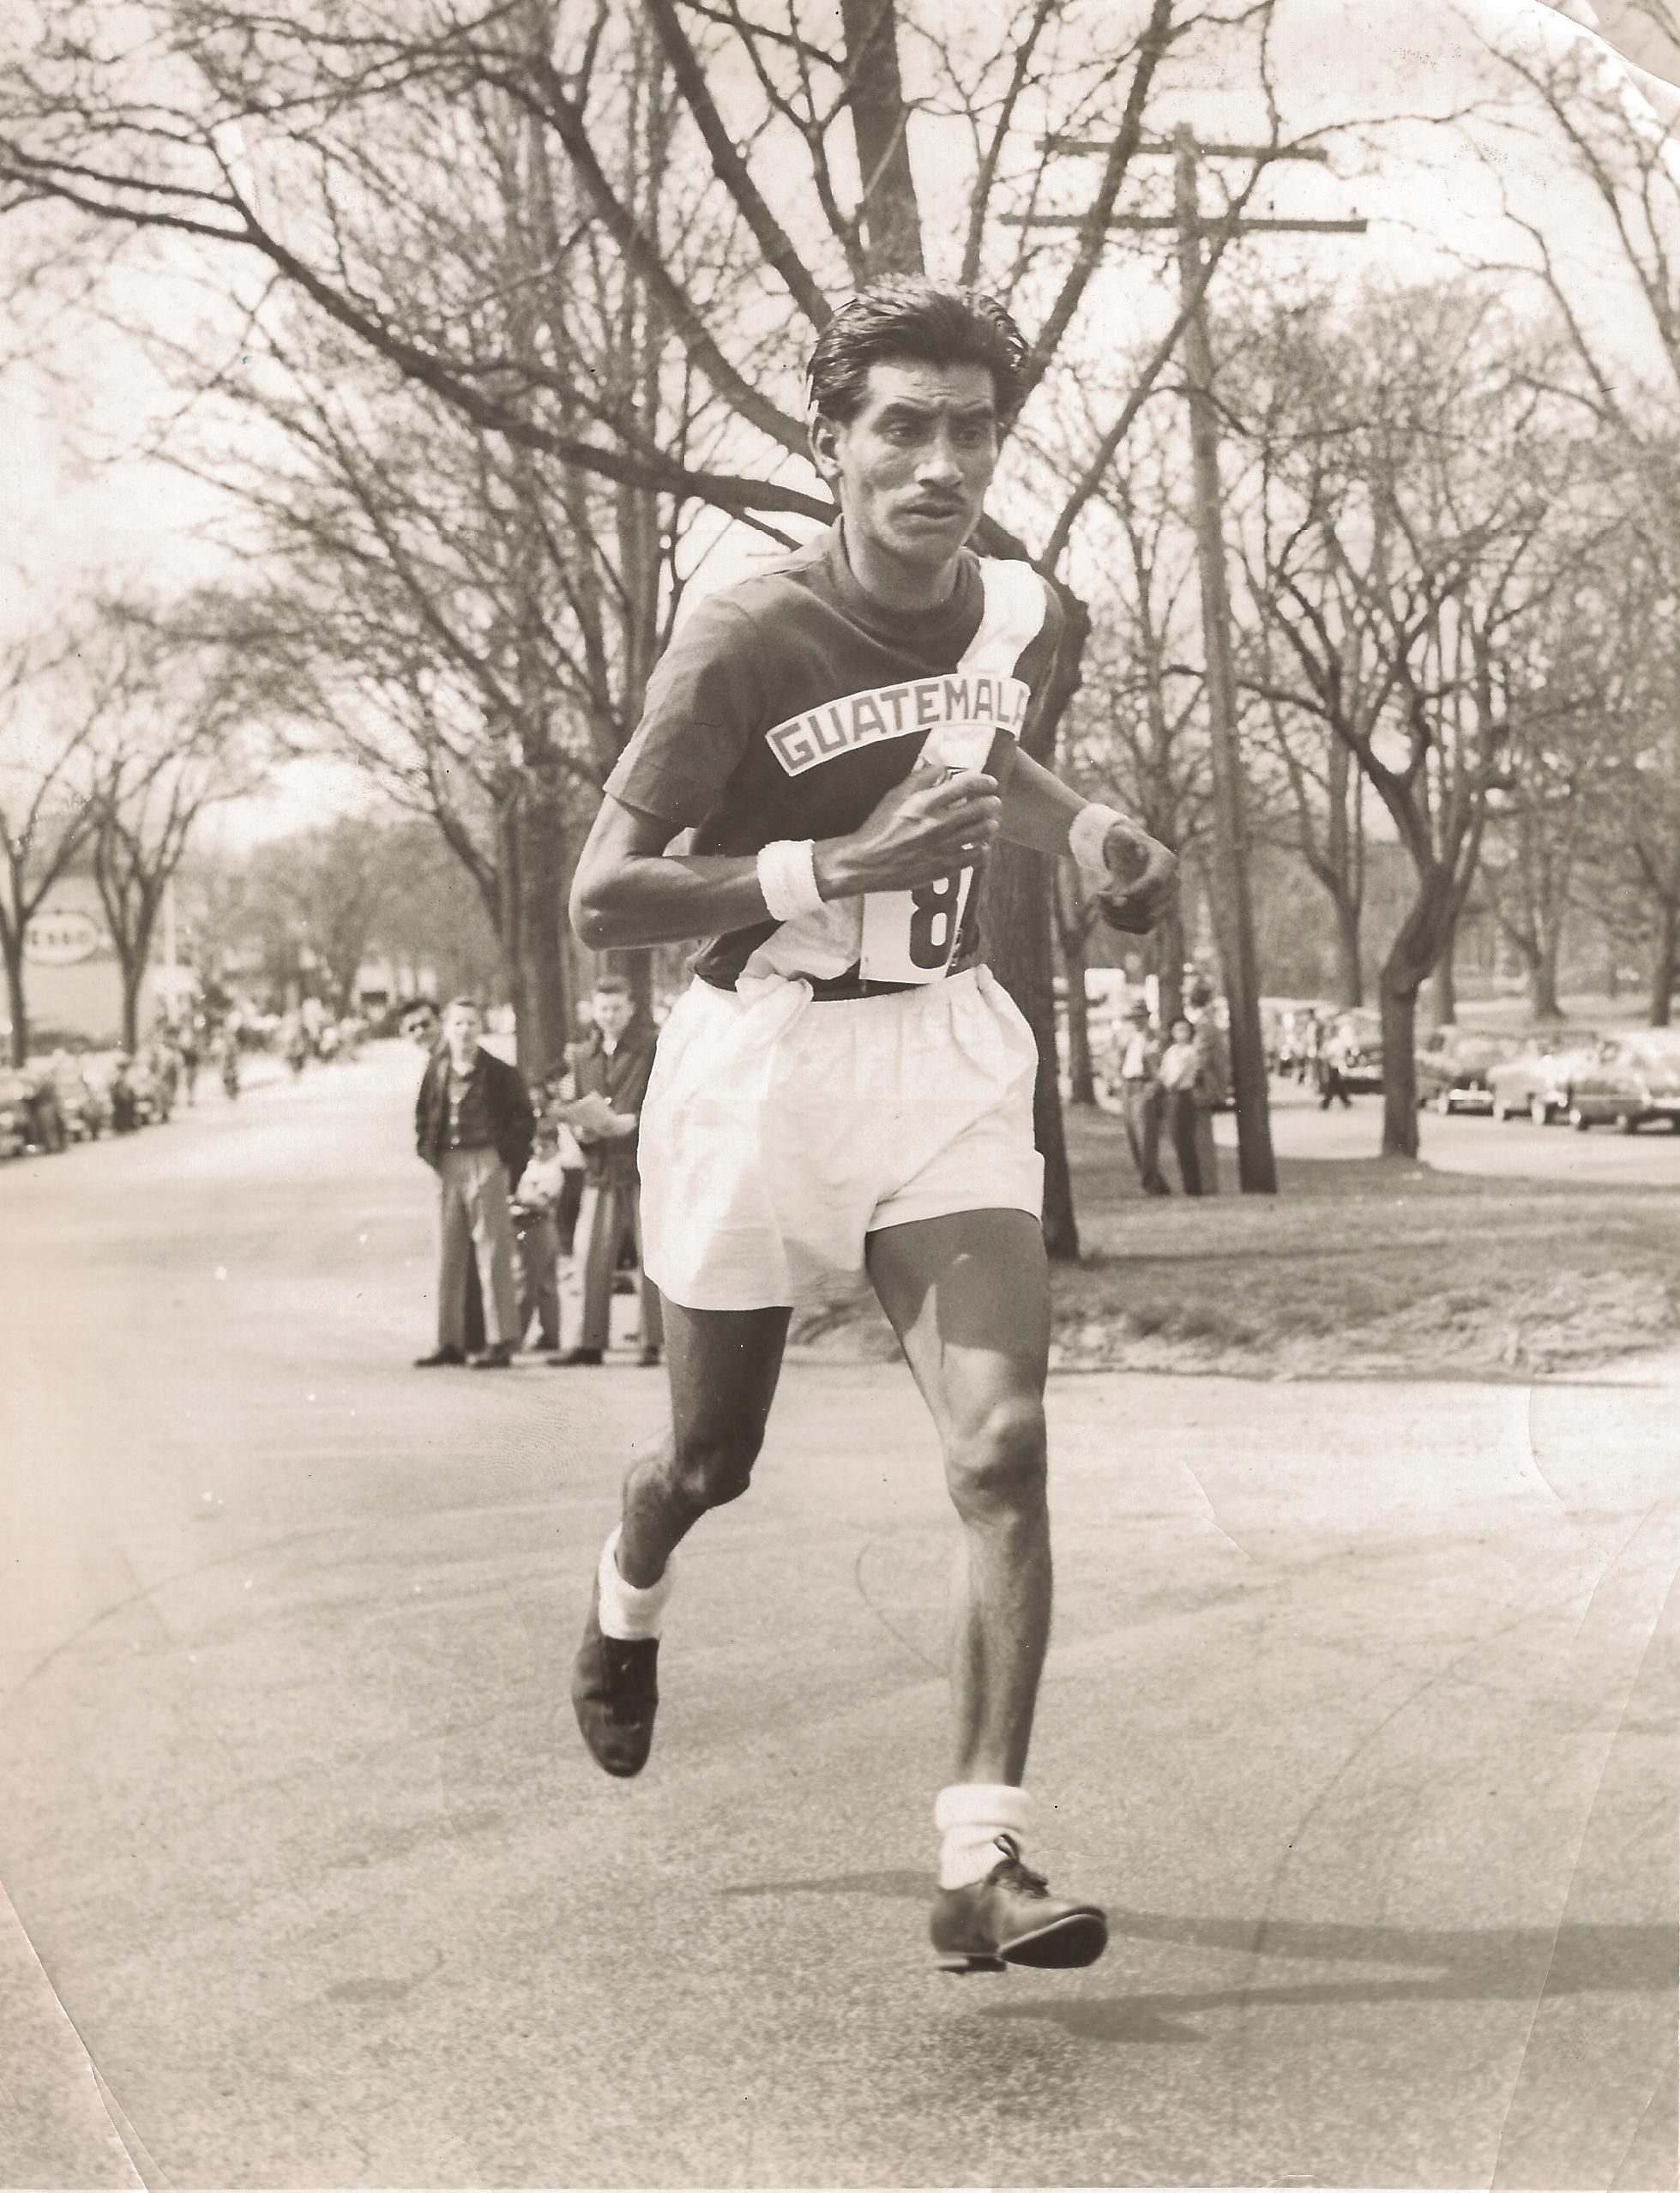 The first Latin American victor of the Boston Marathon